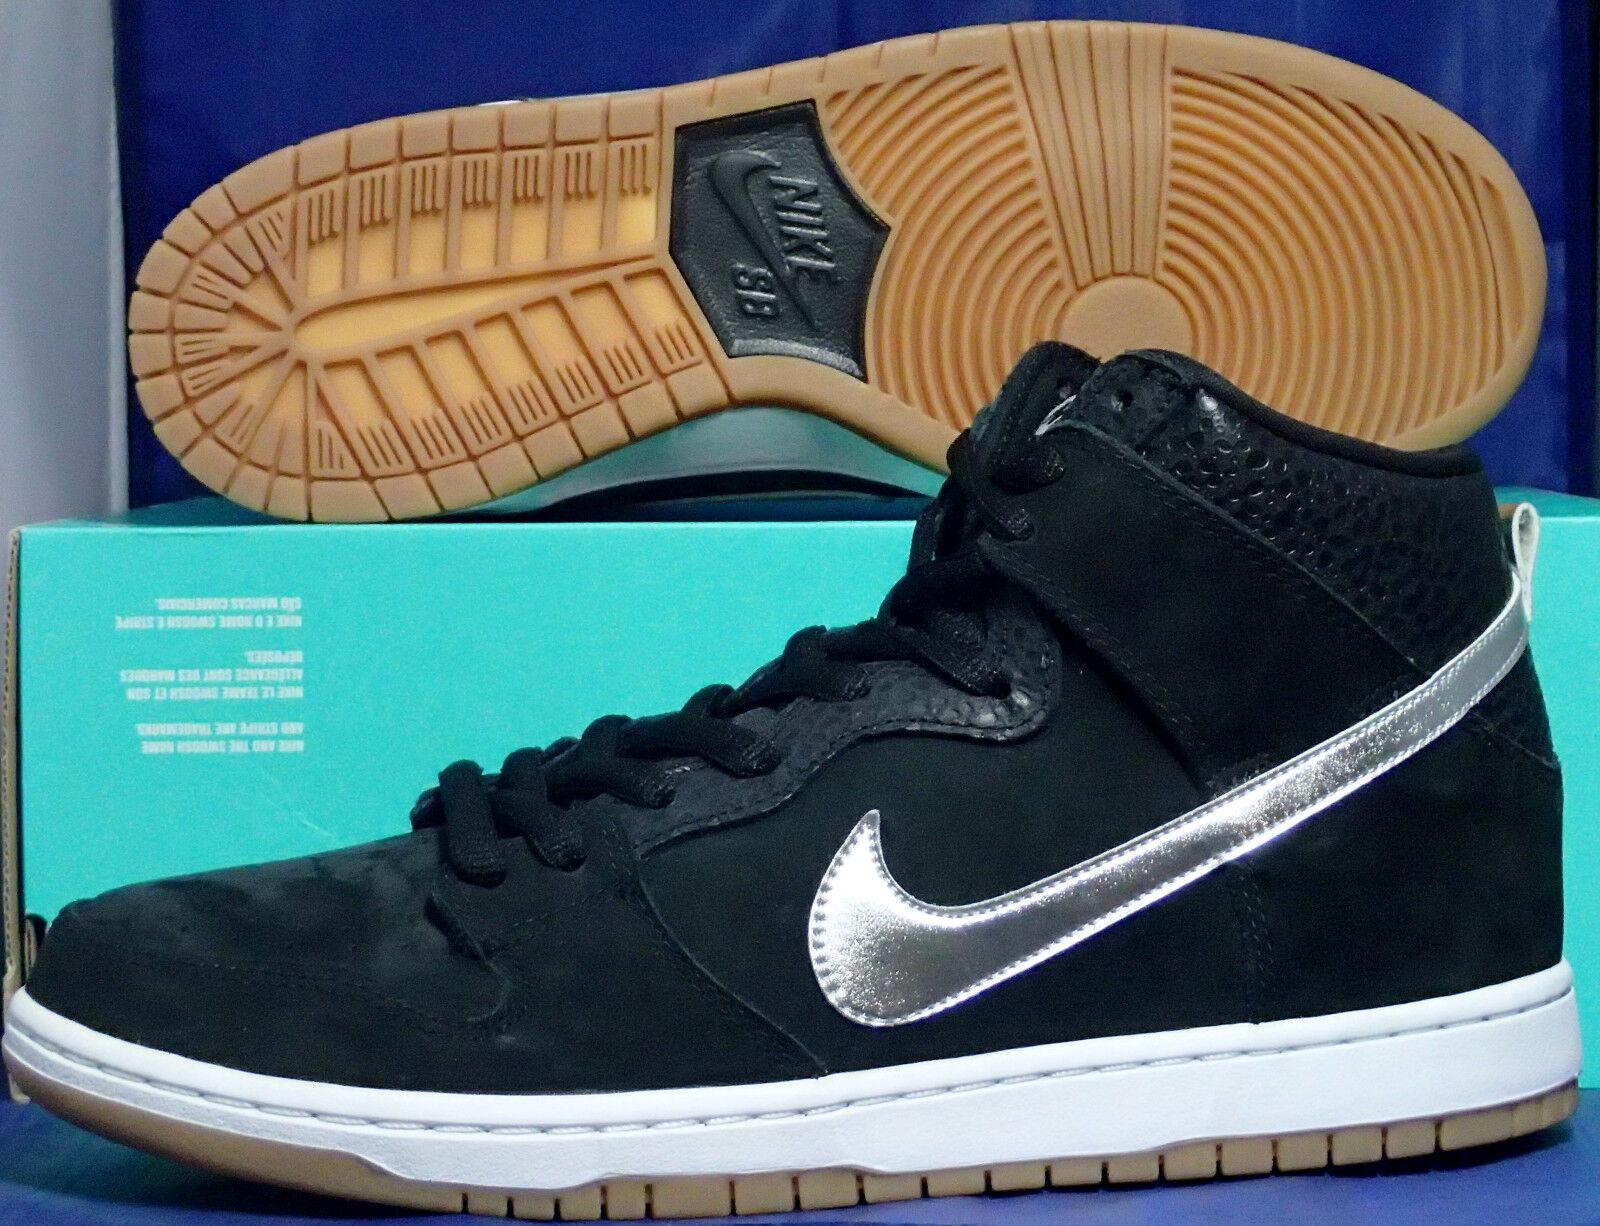 Nike e alto premio sb somp nigel sylvester sz (635535-001)